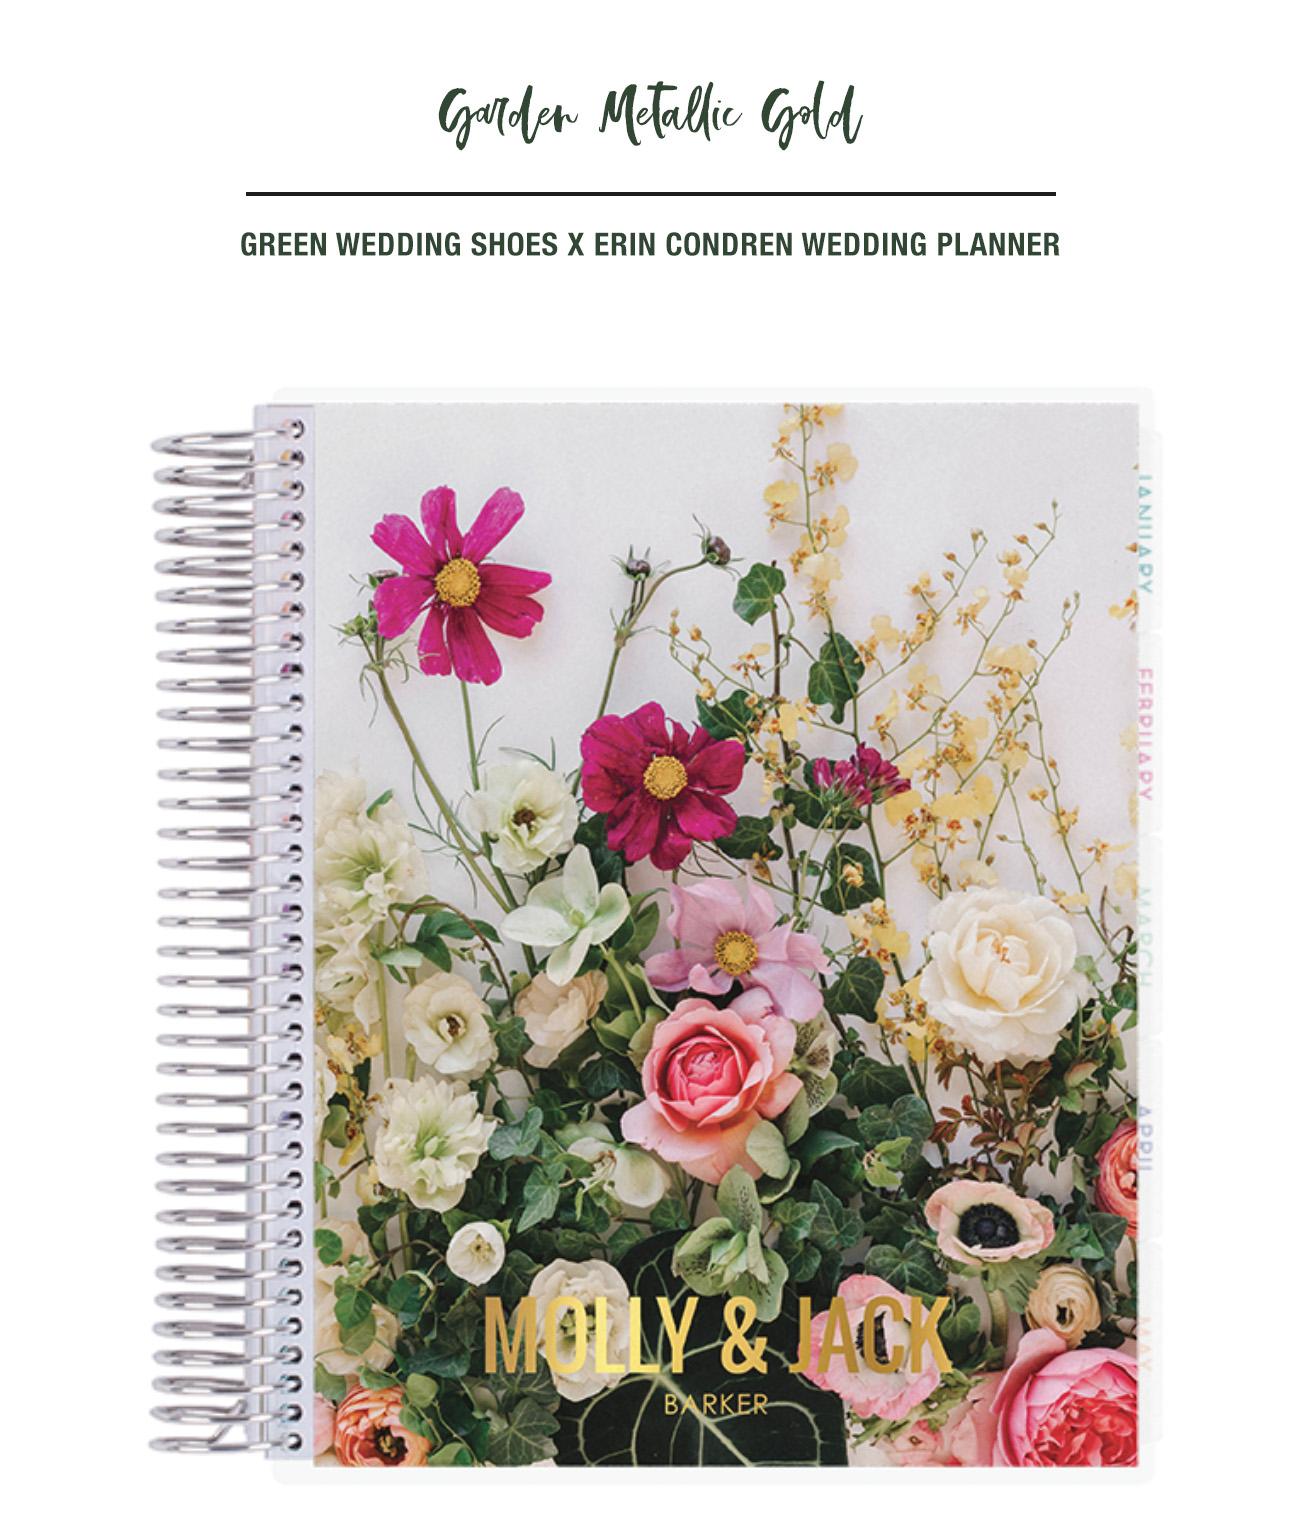 Green Wedding Shoes x Erin Condren Wedding Planner Garden Metallic Gold Cover